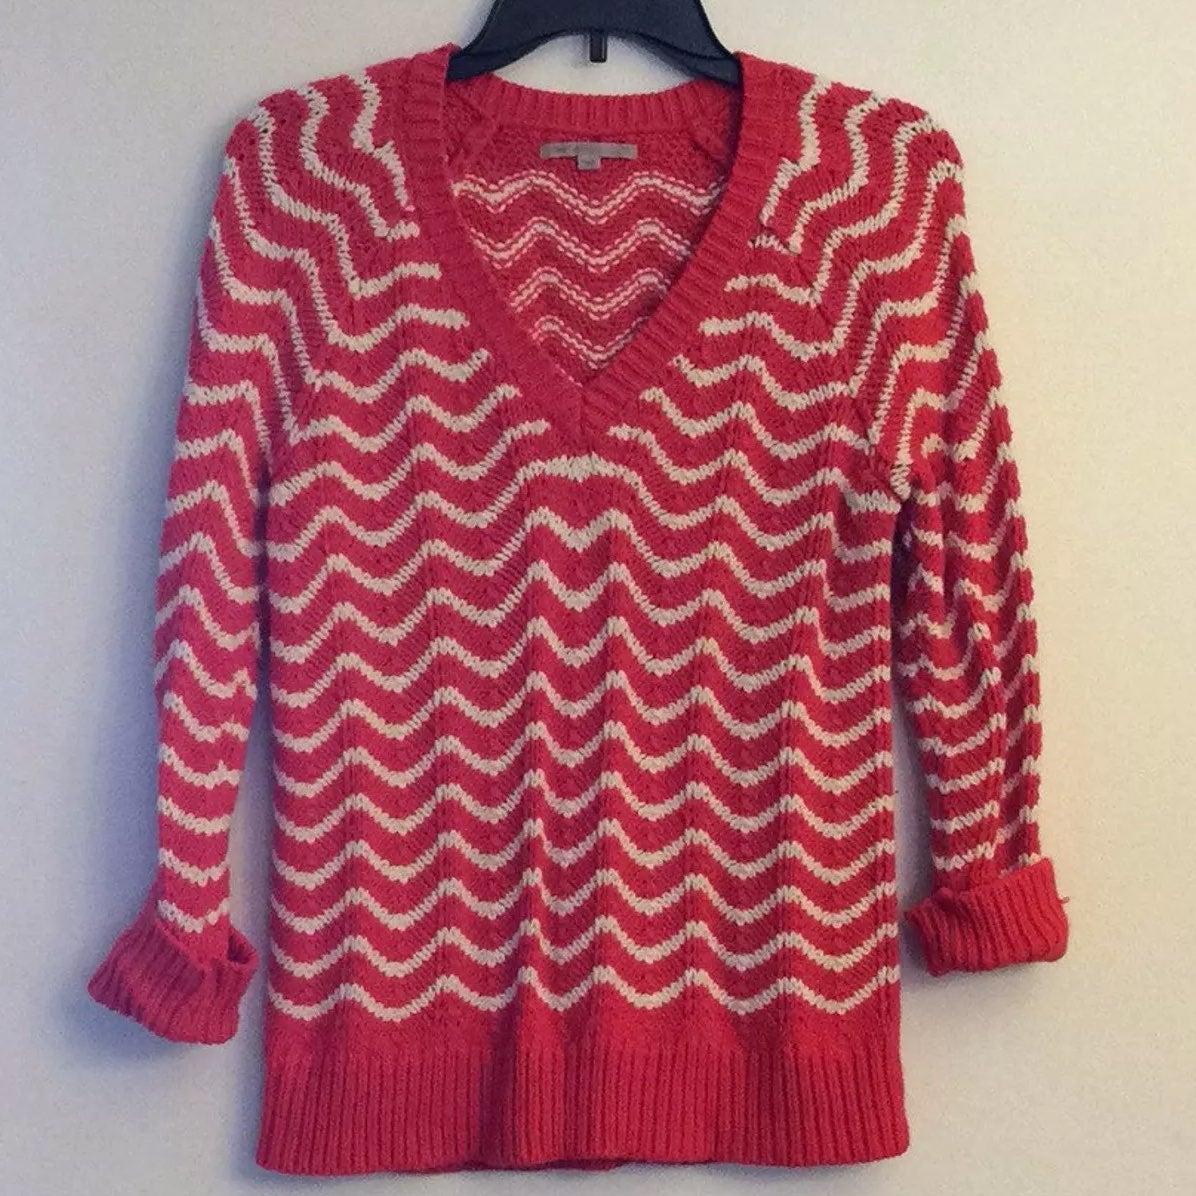 GAP Red White Wavy Striped Sweater - Mercari: BUY & SELL THINGS ...